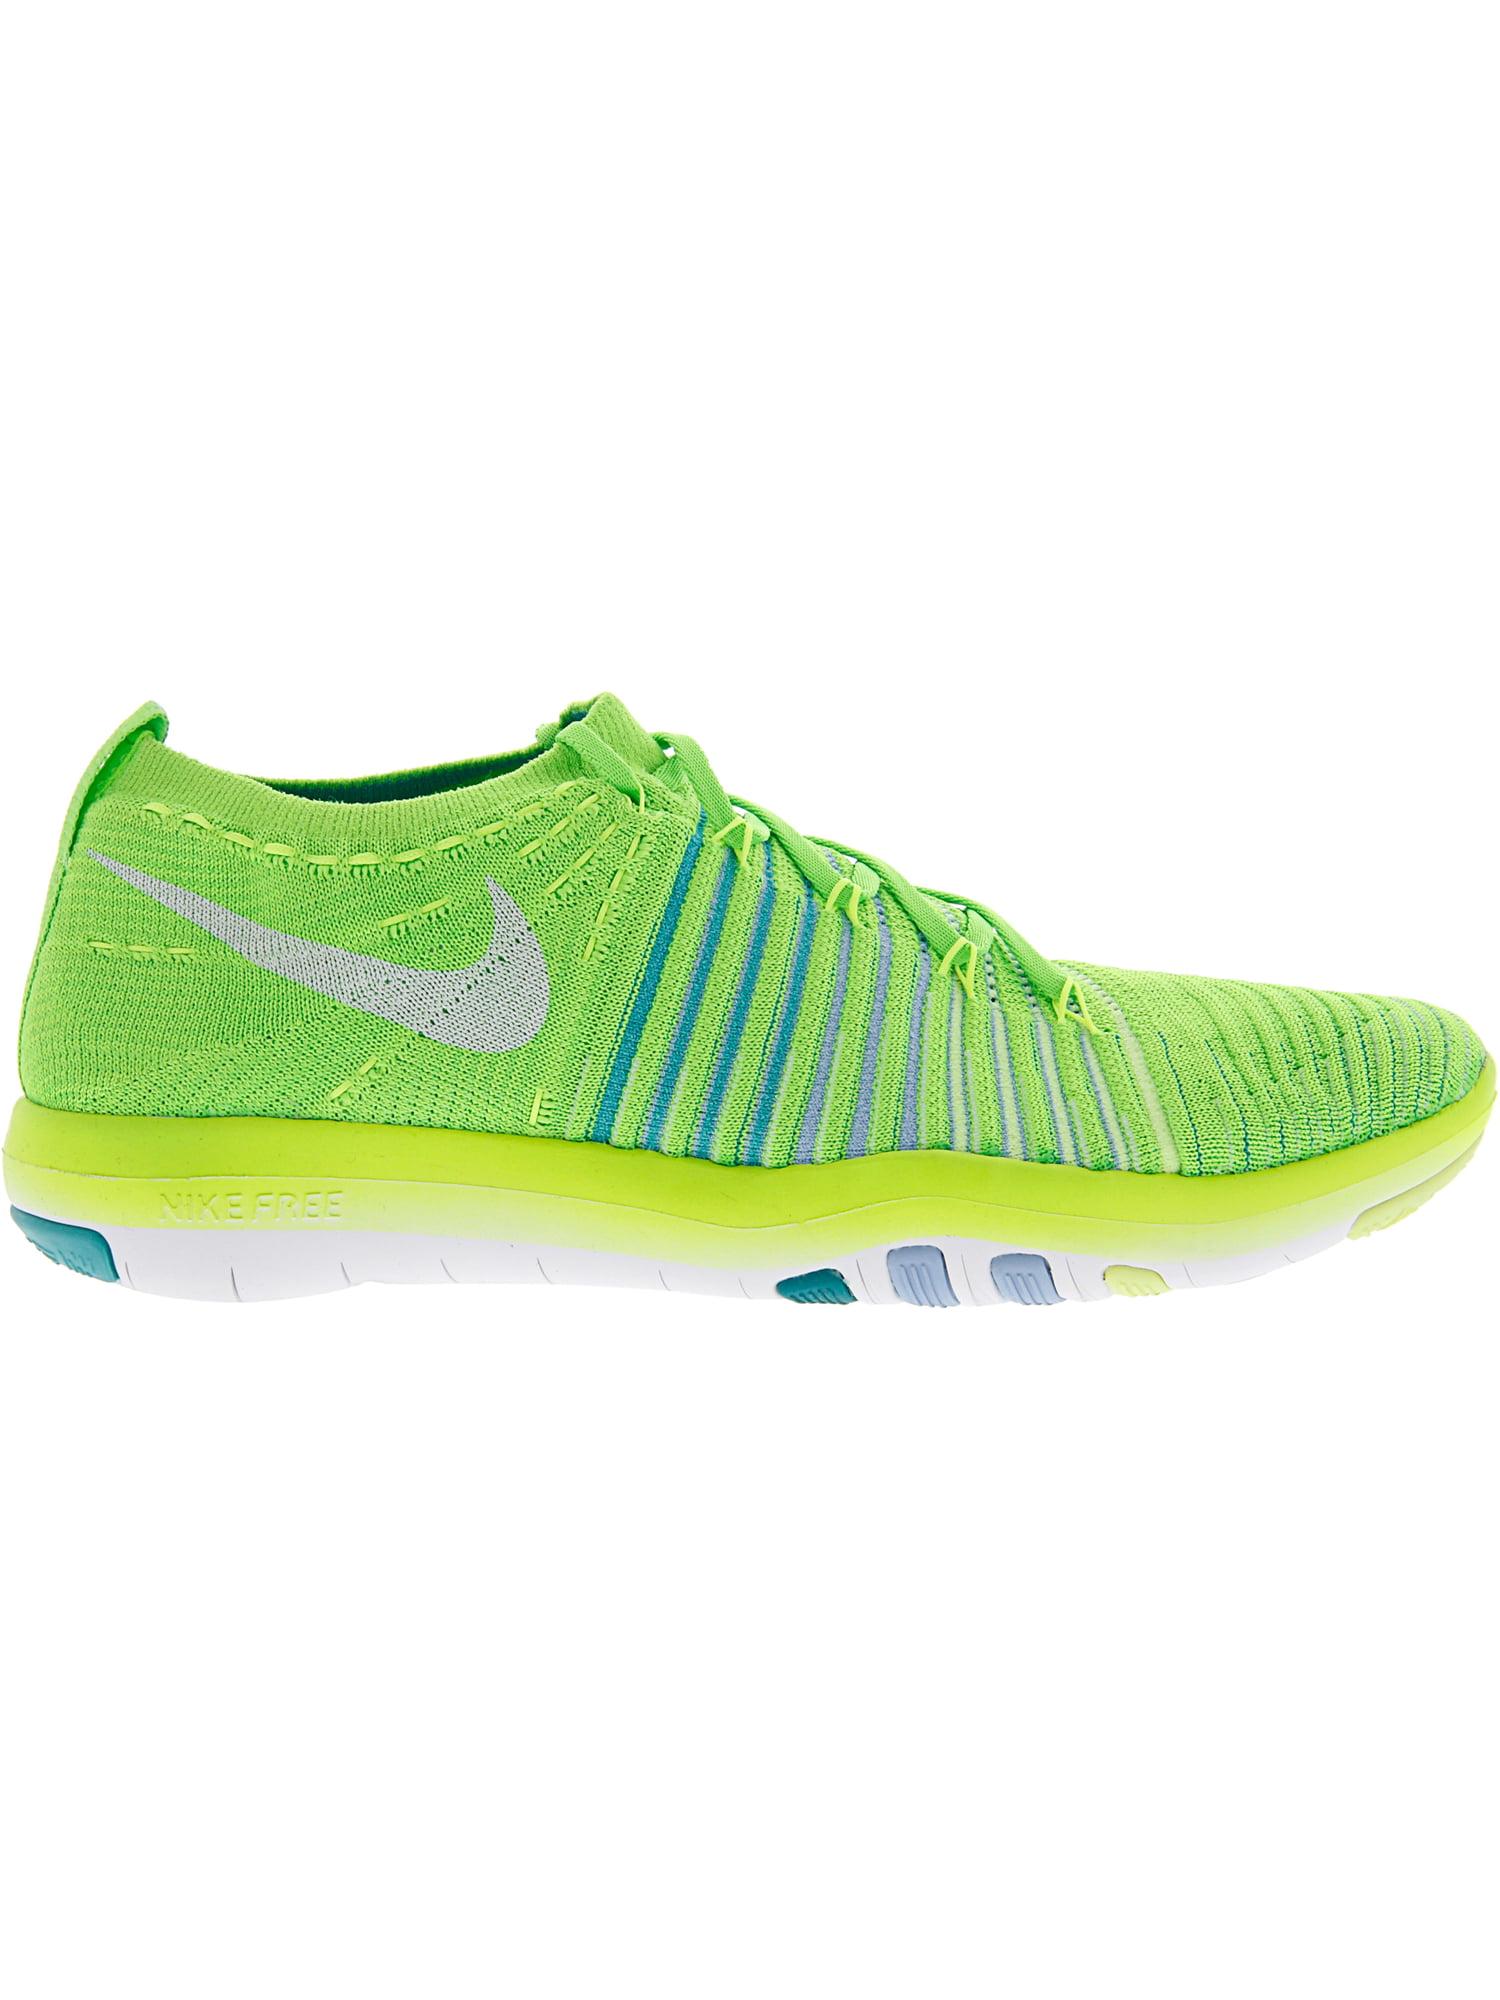 f78ffef3e3b3 Nike Women s Free Transform Flyknit Electric Green   White - Hyper Jade  Bluecap Ankle-High Fabric Training Shoes 9.5M